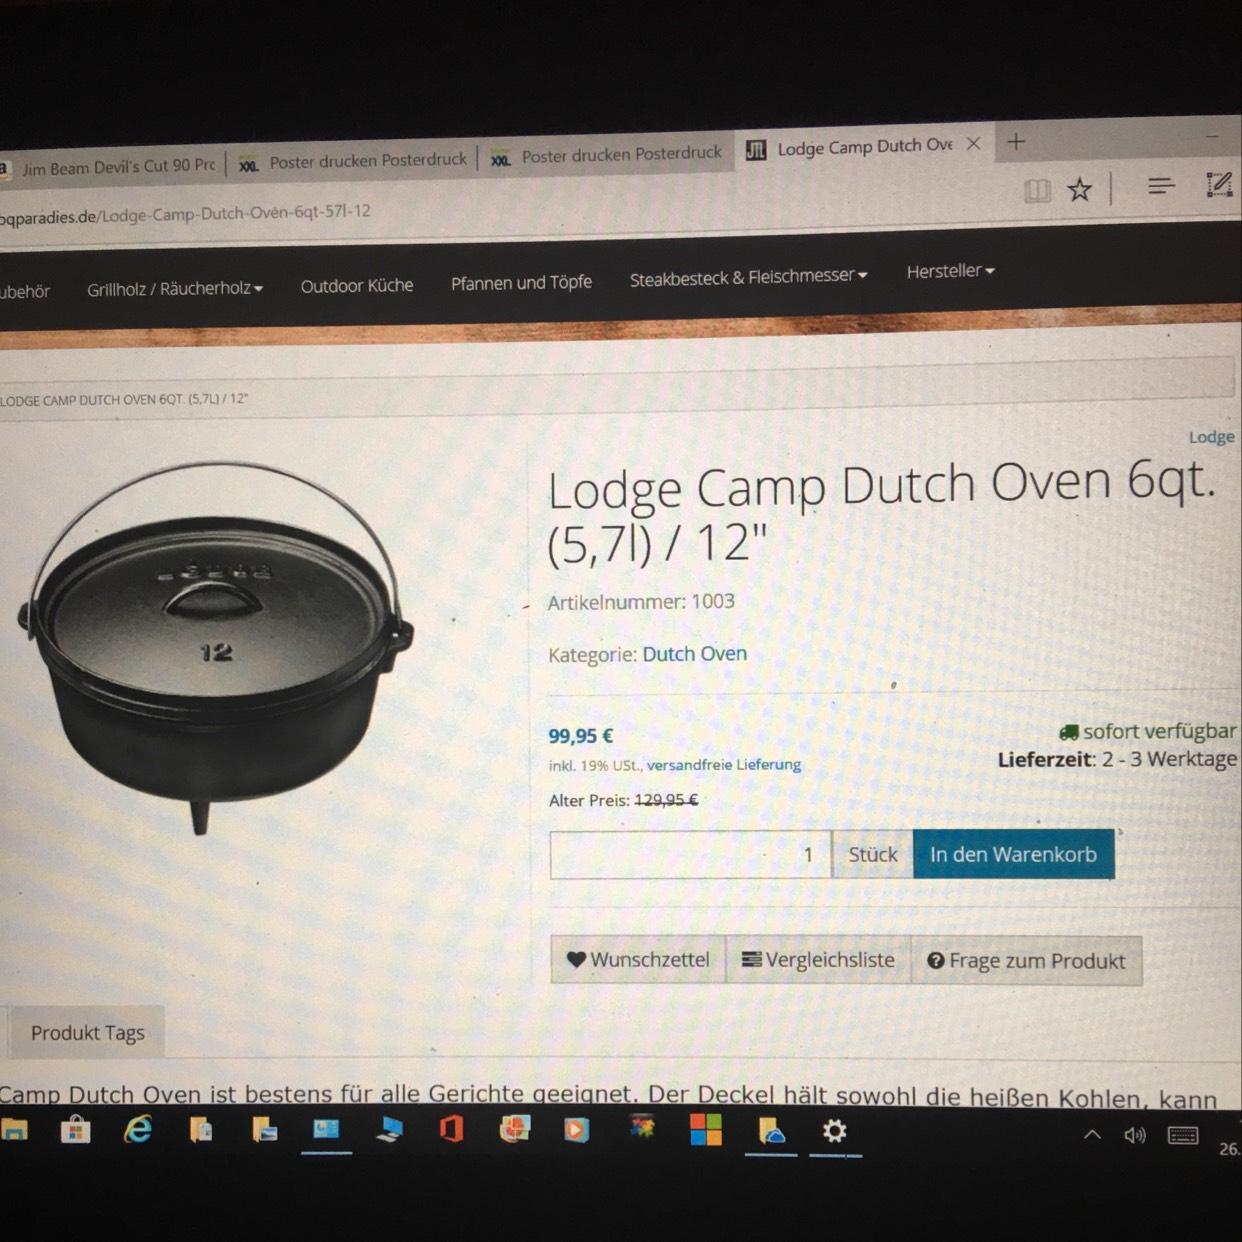 Lodge Camp Dutch Oven